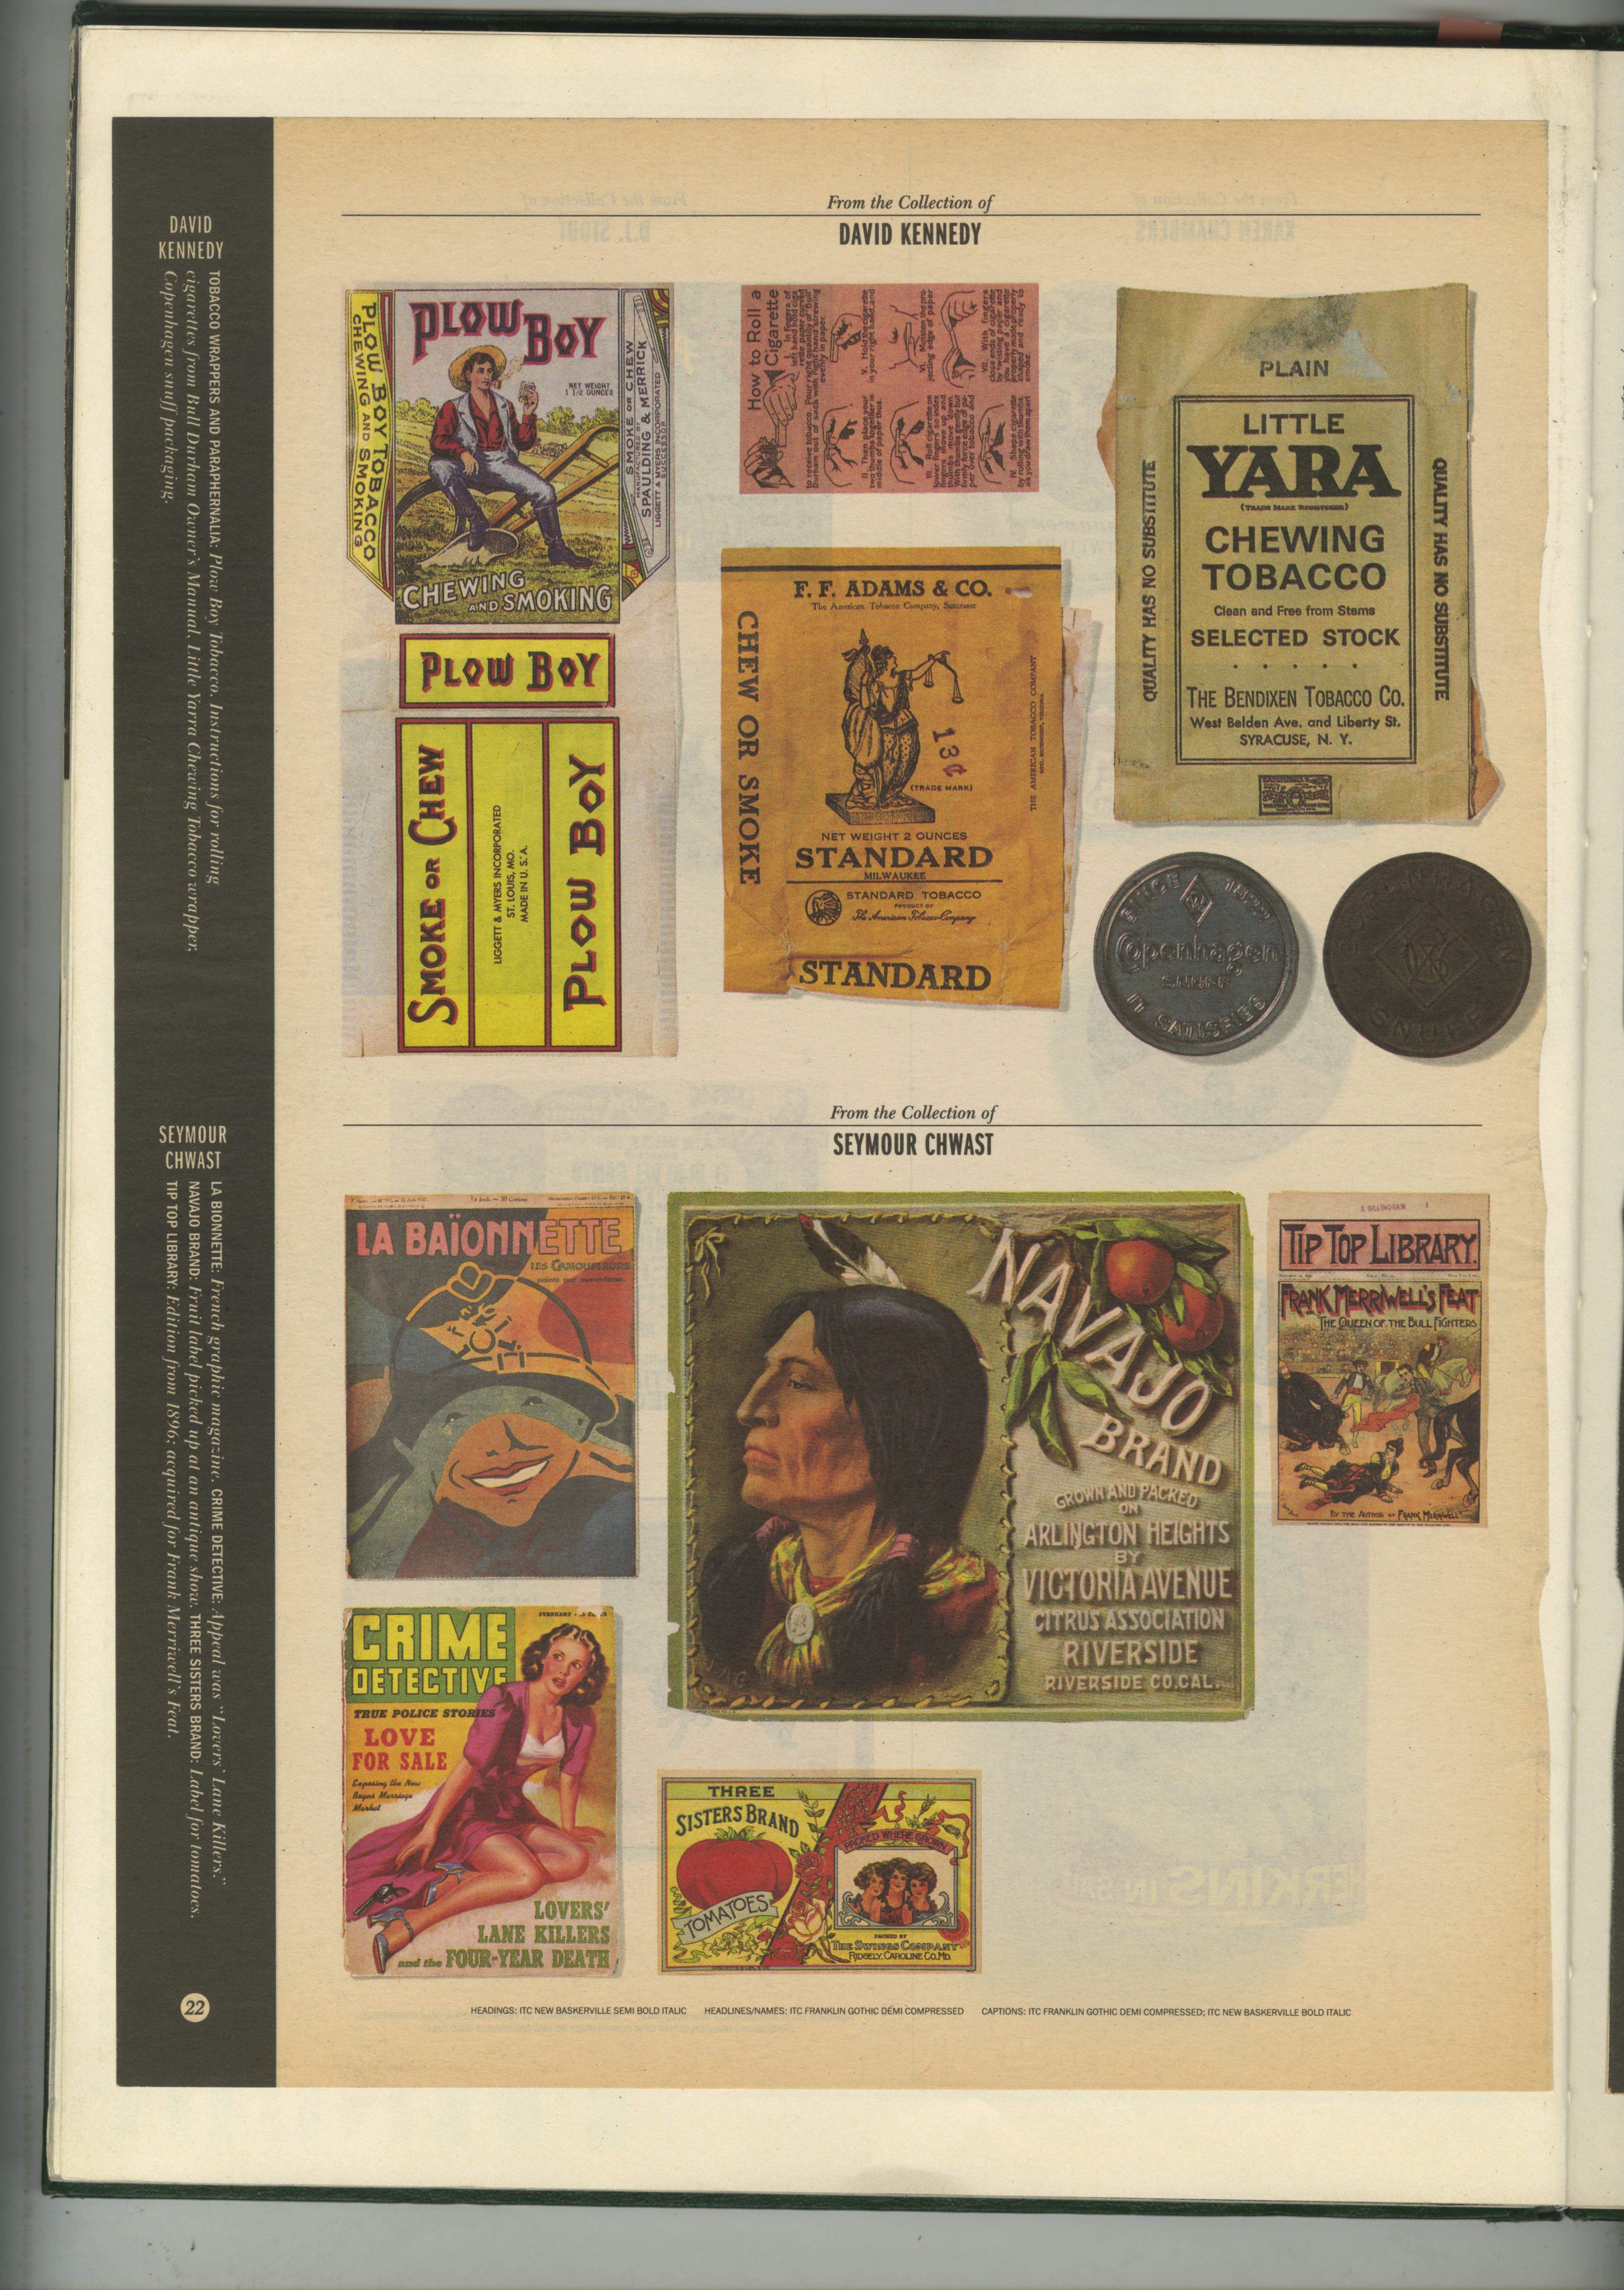 60. GREEN BOOKS: 'Type'